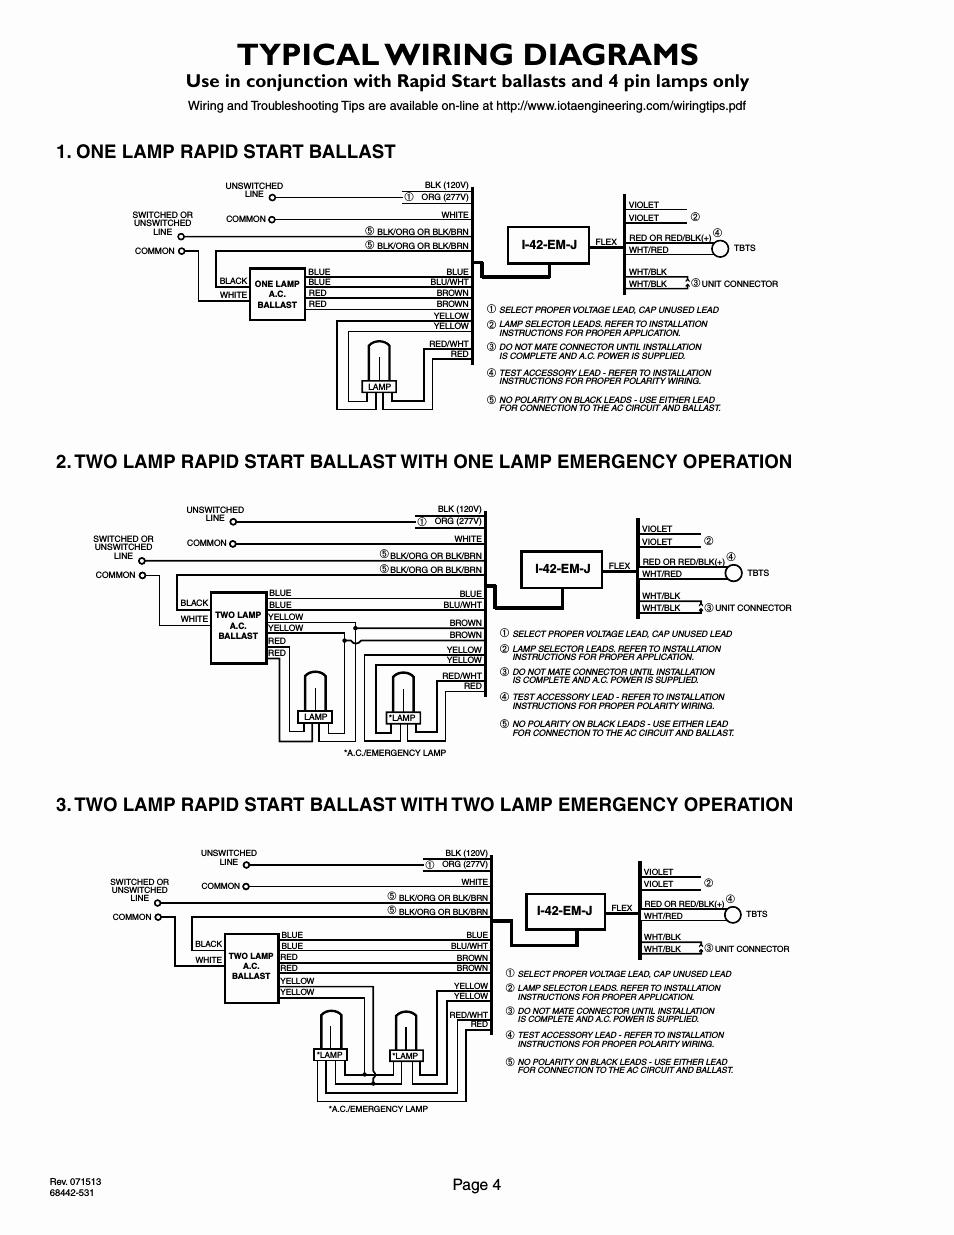 hight resolution of power sentry psq500 wiring diagram wiring schematic diagram 53 ballast wiring diagrams besides power sentry emergency ballast wiring